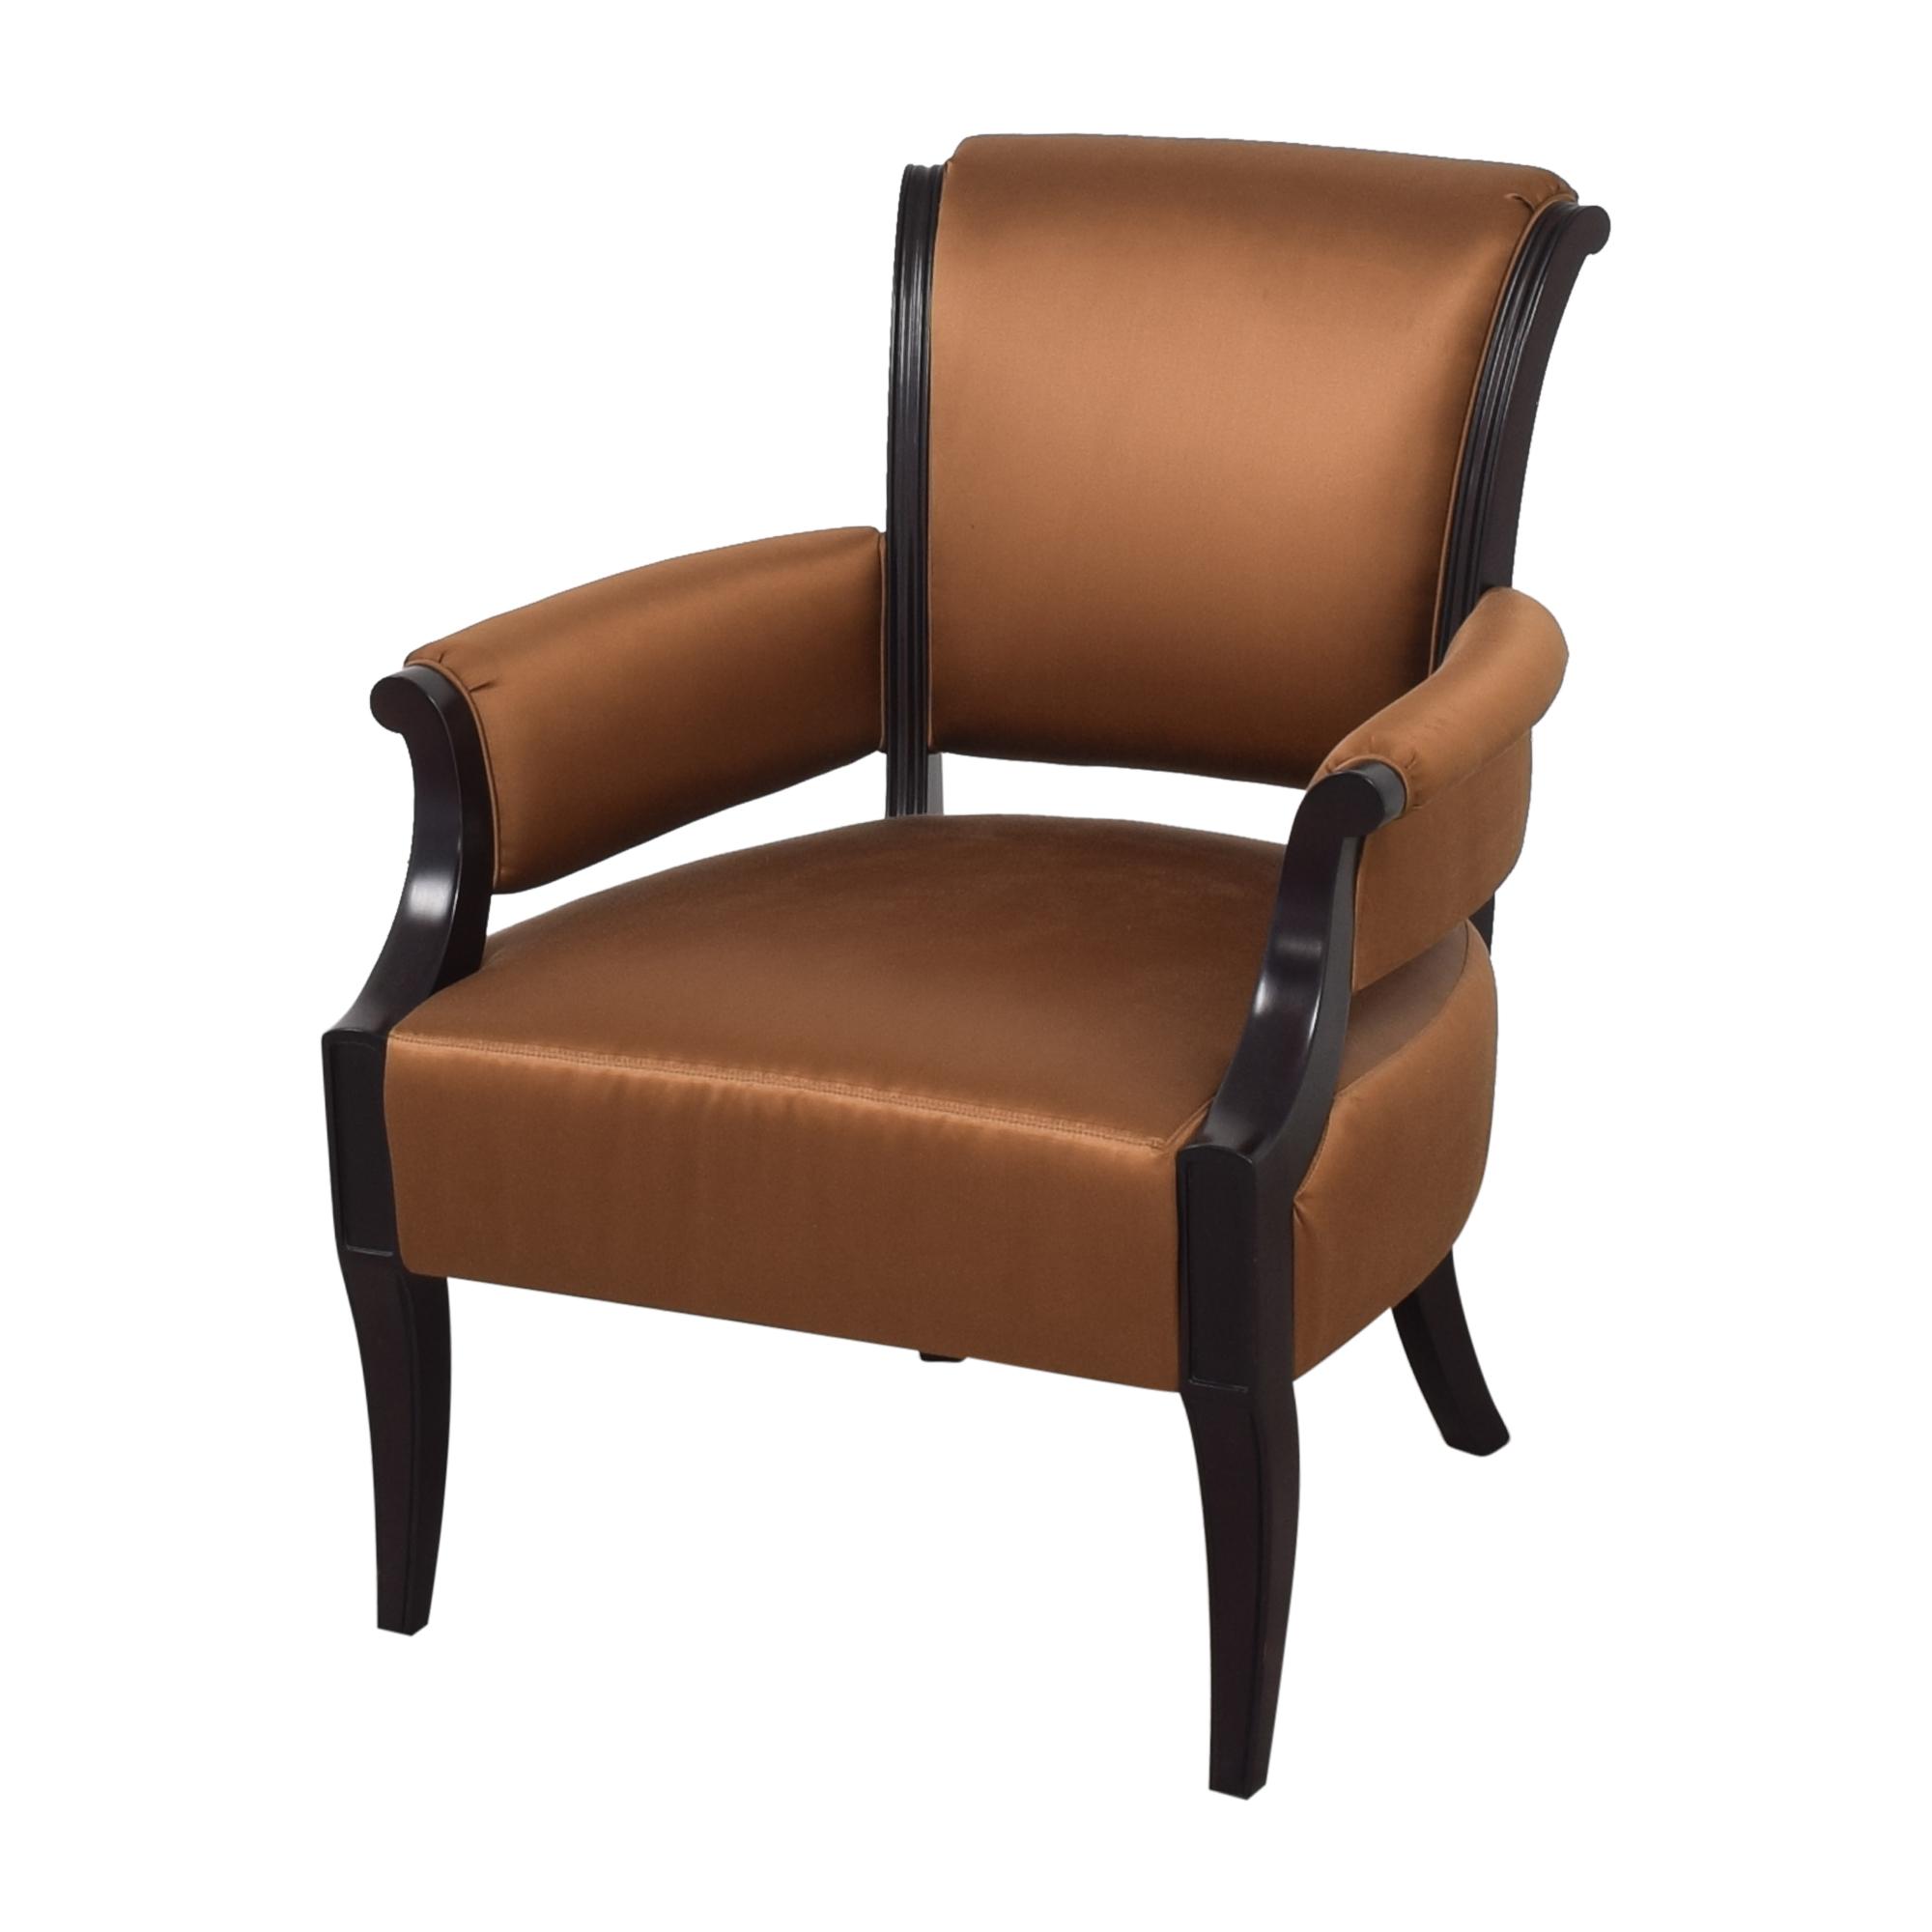 Baker Furniture Baker Furniture Barbara Barry Upholstered Chair ma